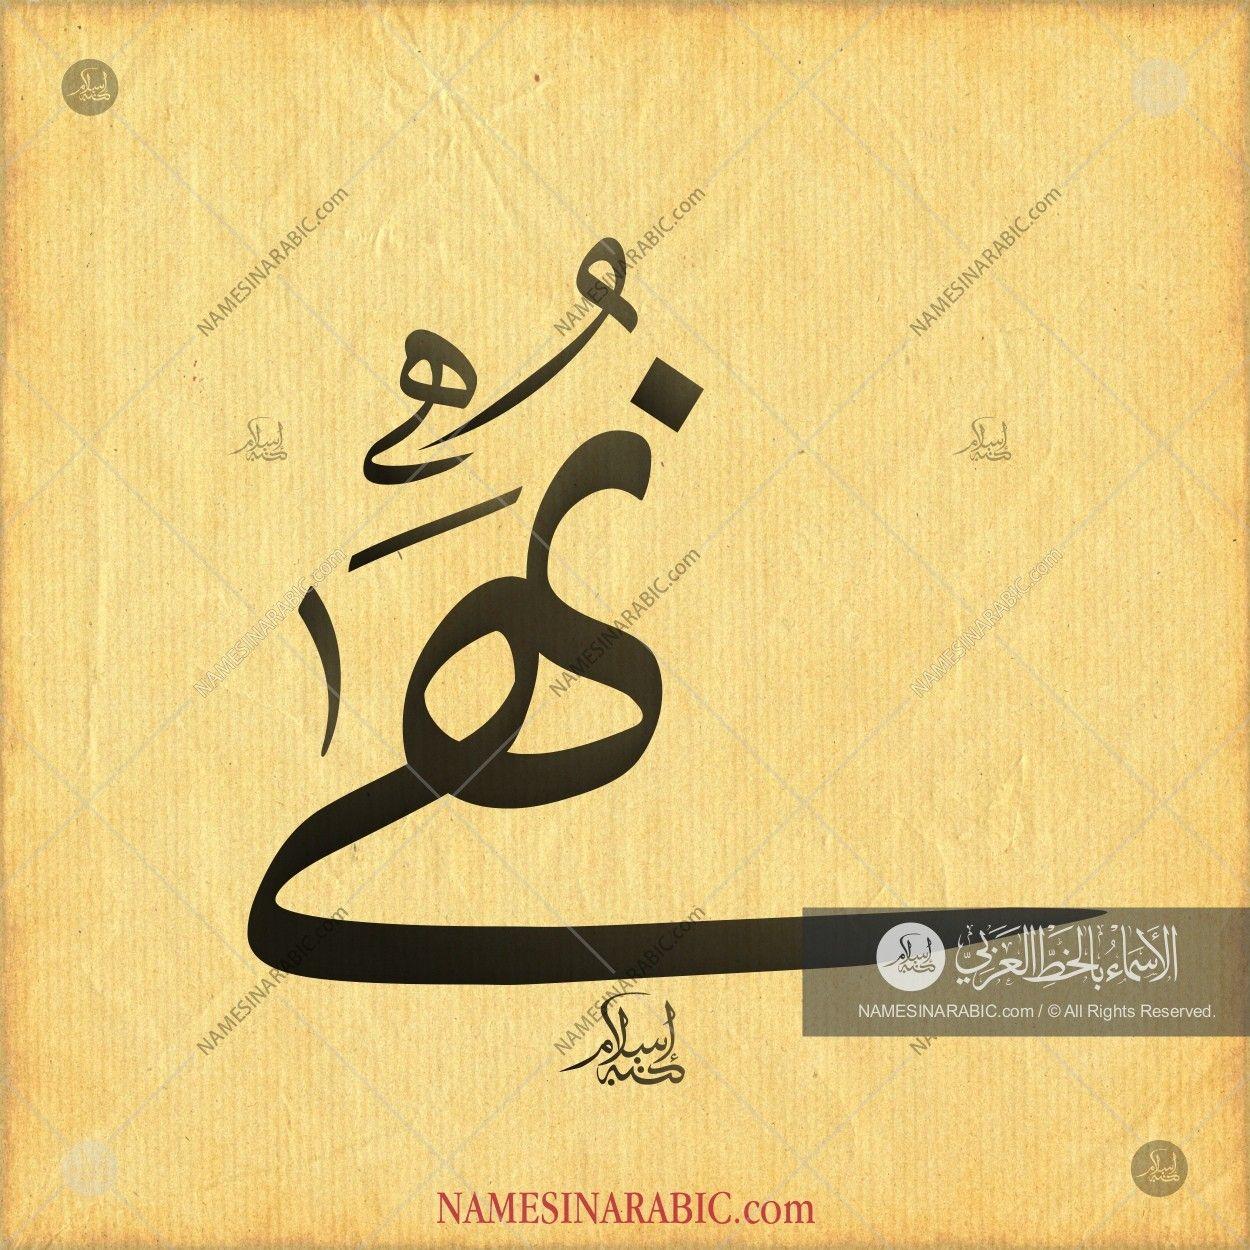 Nuha نهى Names In Arabic Calligraphy Name 3169 Calligraphy Calligraphy Name Arabic Calligraphy